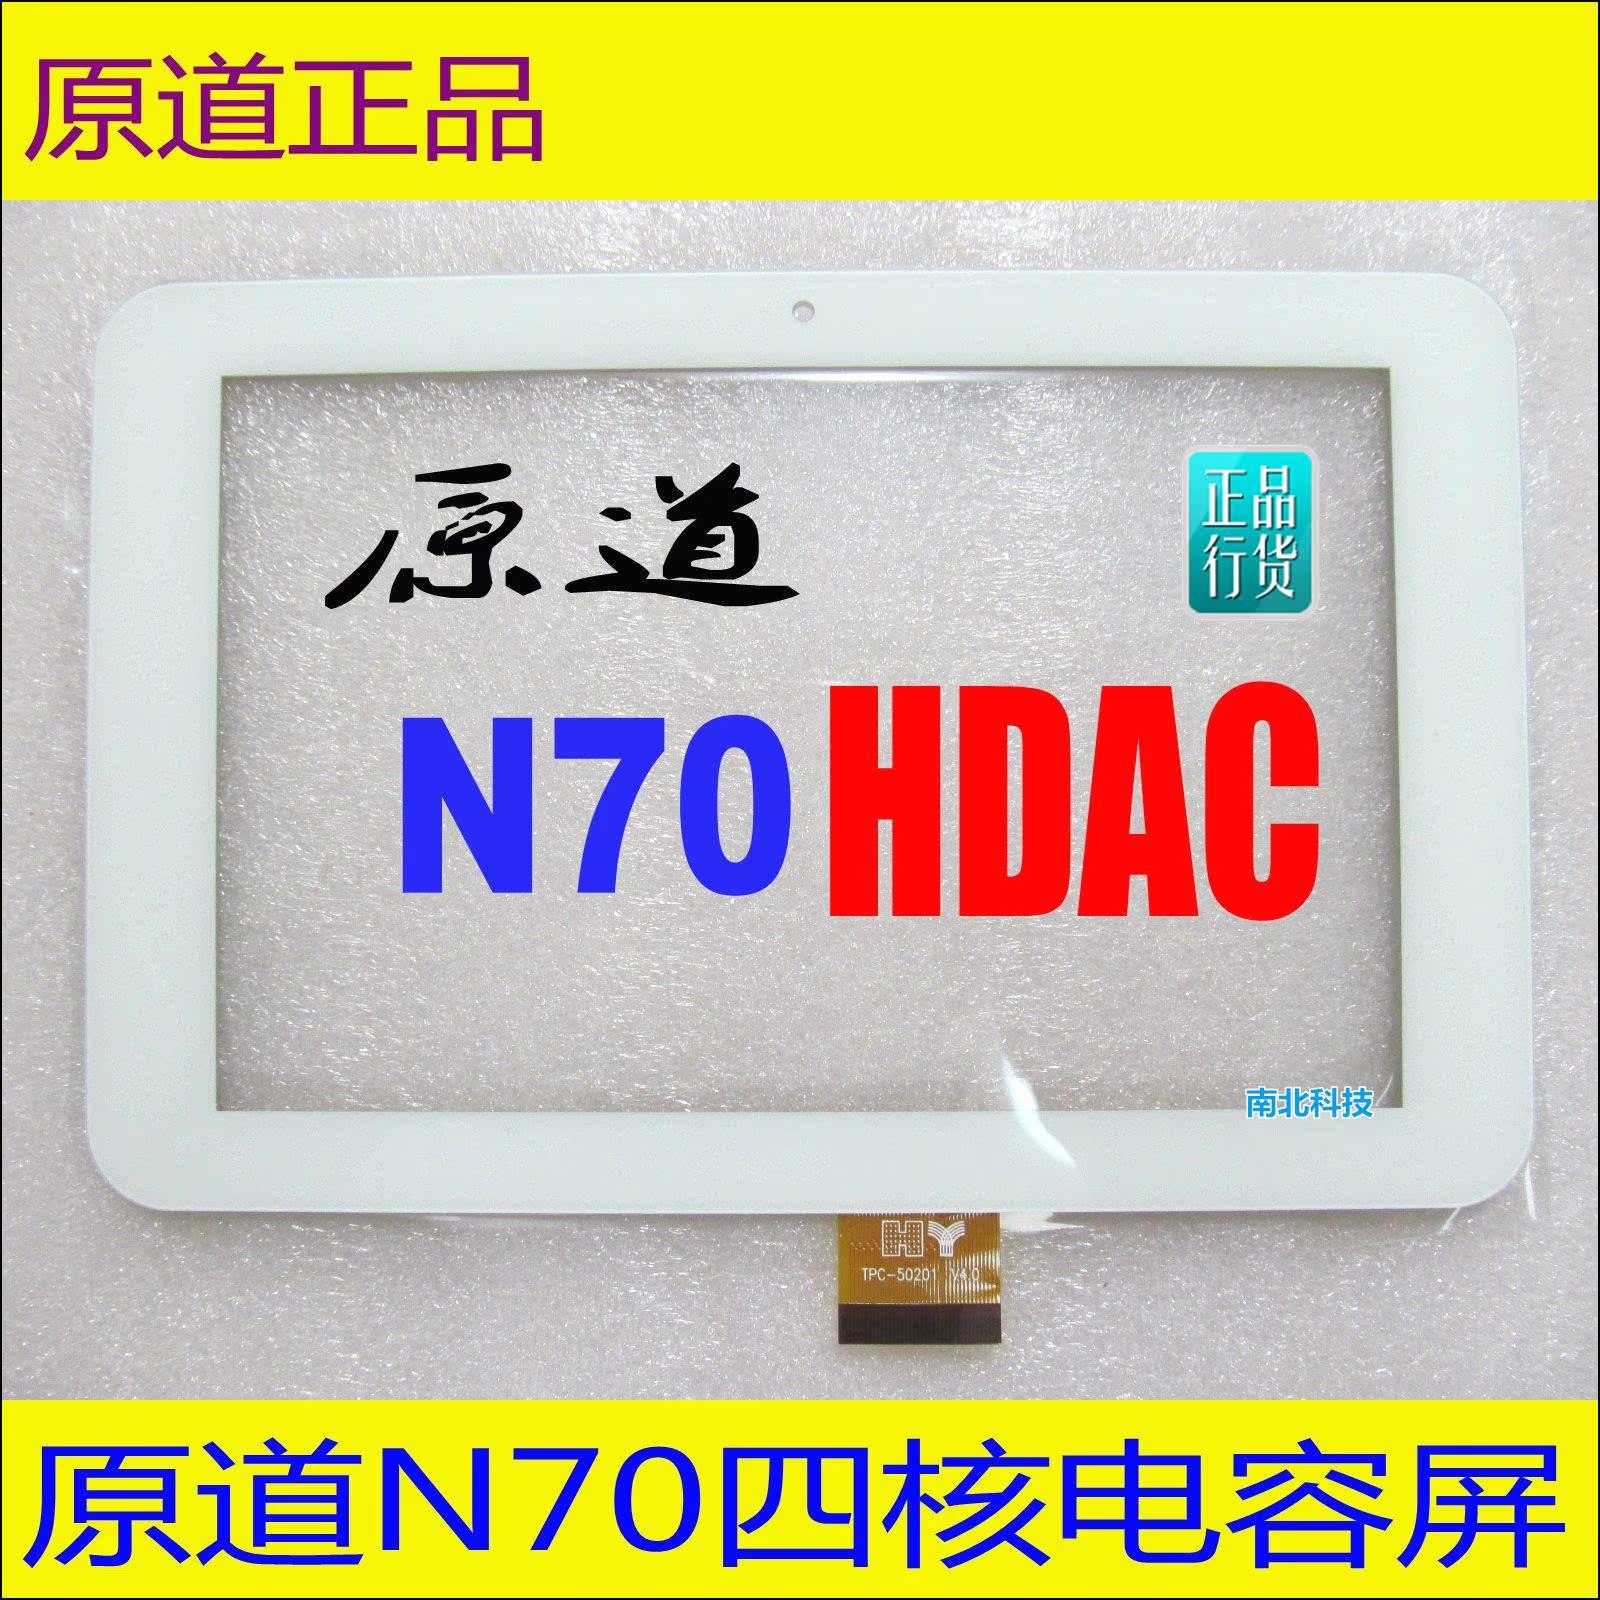 Запчасти для планшетных устройств N70HDAC запчасти для планшетных устройств tpc1646 ver1 0